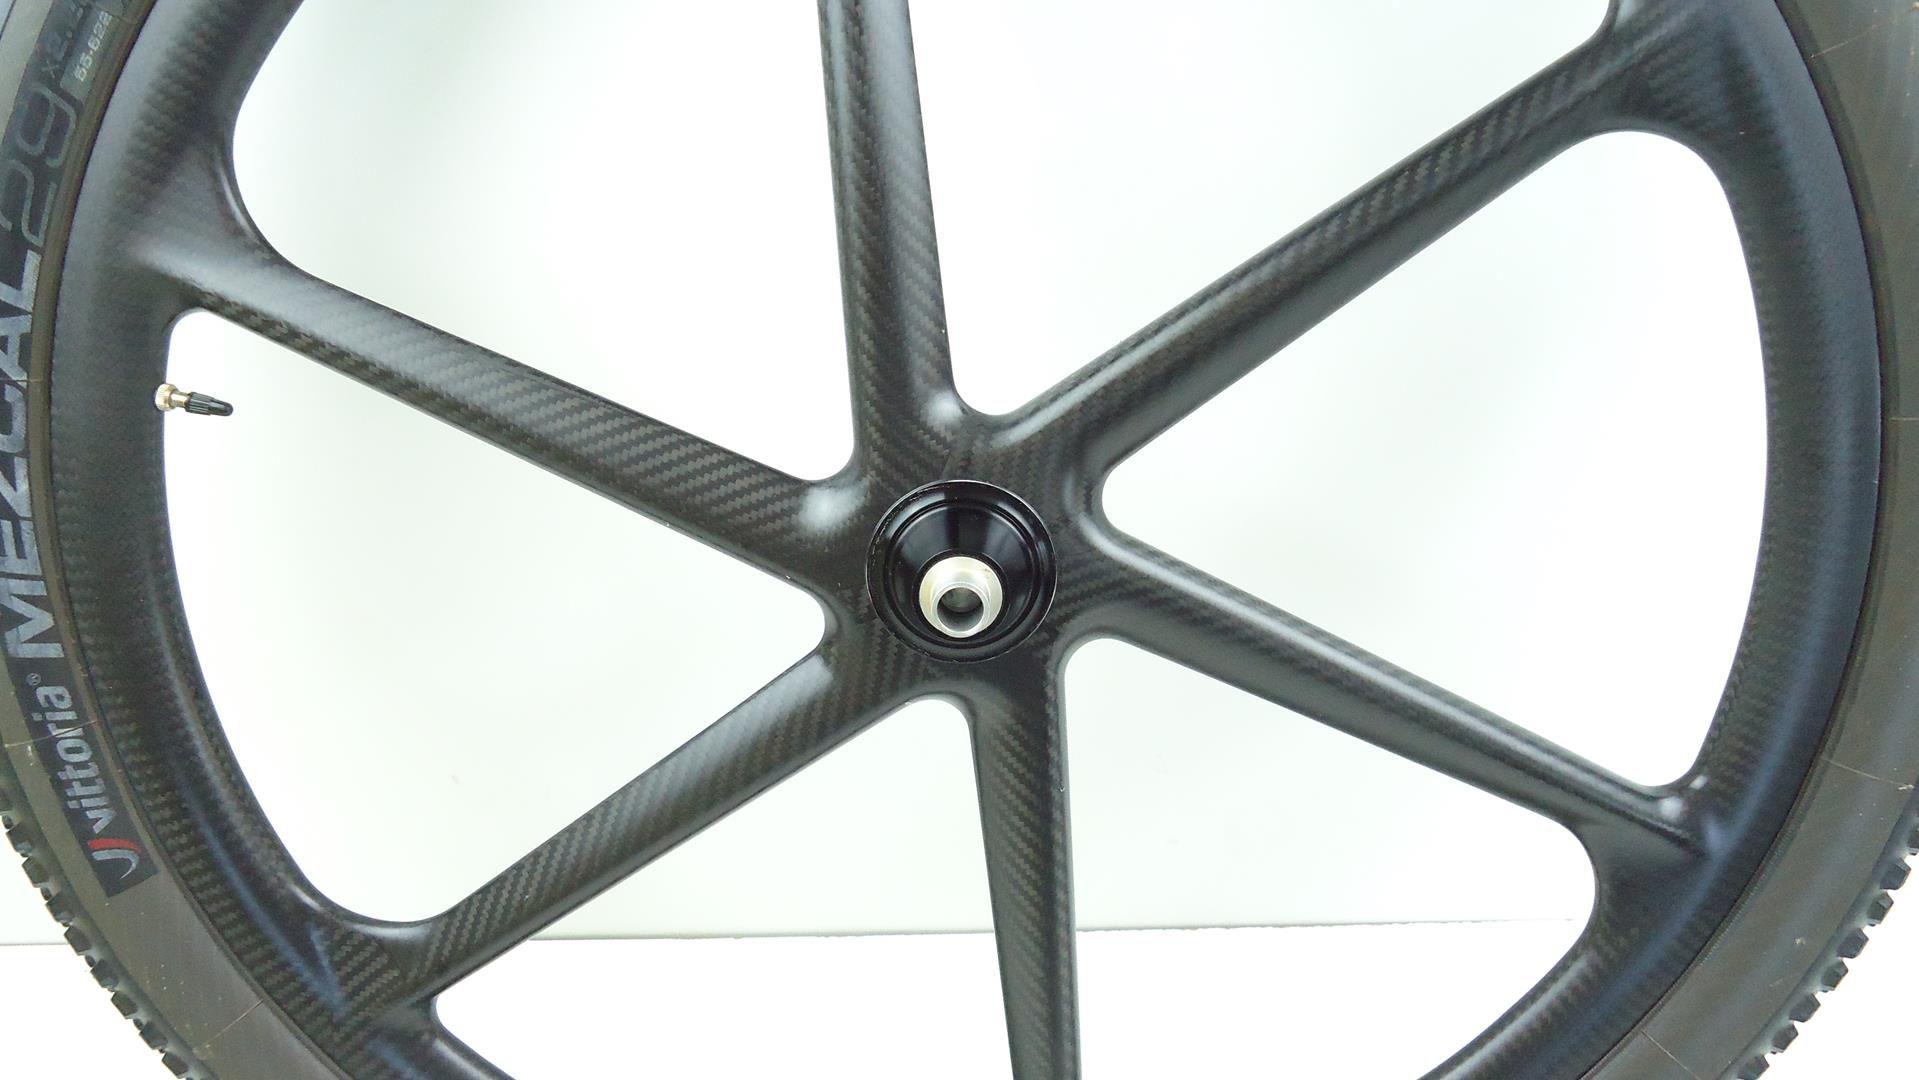 Rodas Aro 29 Full Carbono 6 Raios p/ Sram XD Eixo Boost 148 ou 142x12mm e 15x100 - USADO